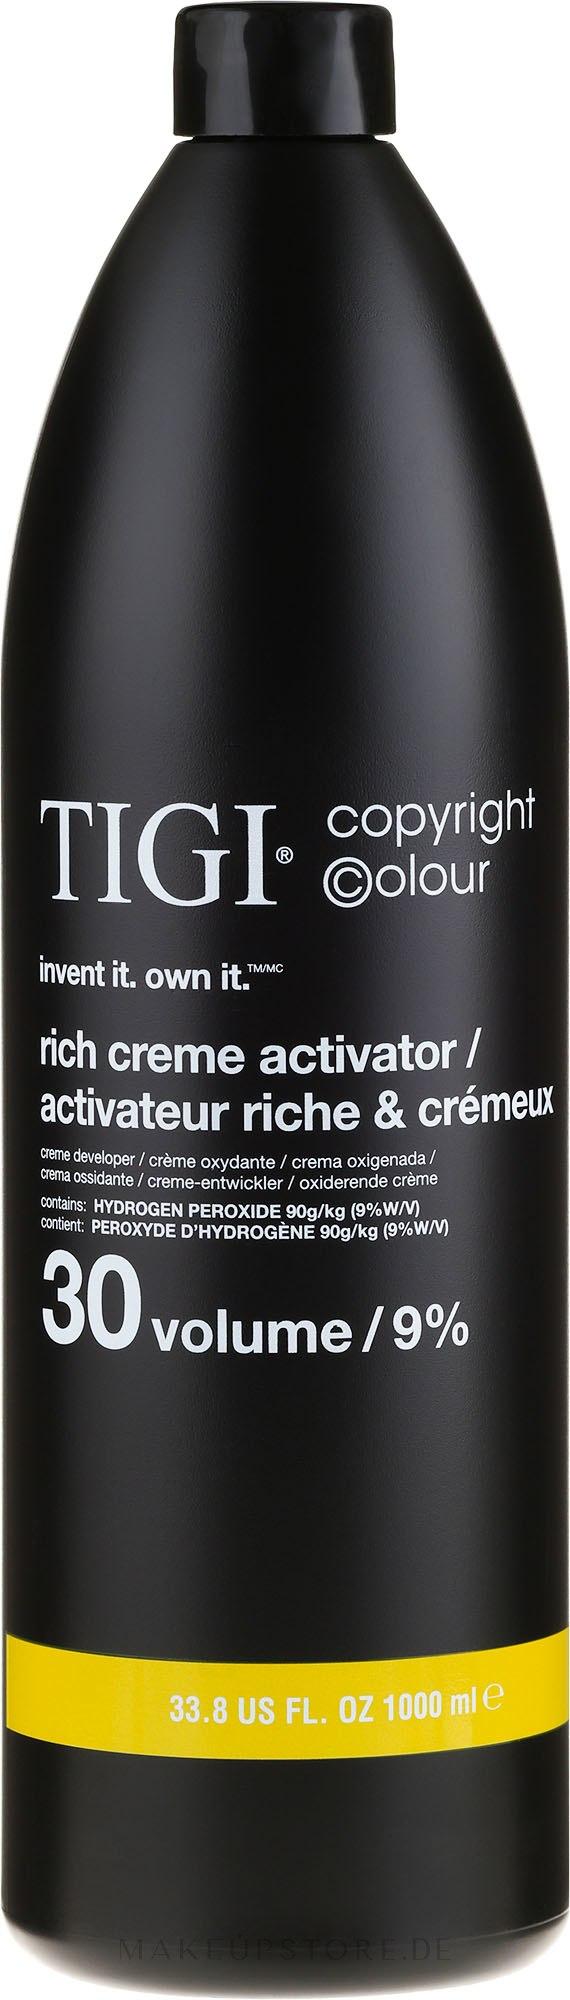 Entwicklerlotion 9% - TIGI Colour Activator 30 vol / 9% — Bild 1000 ml